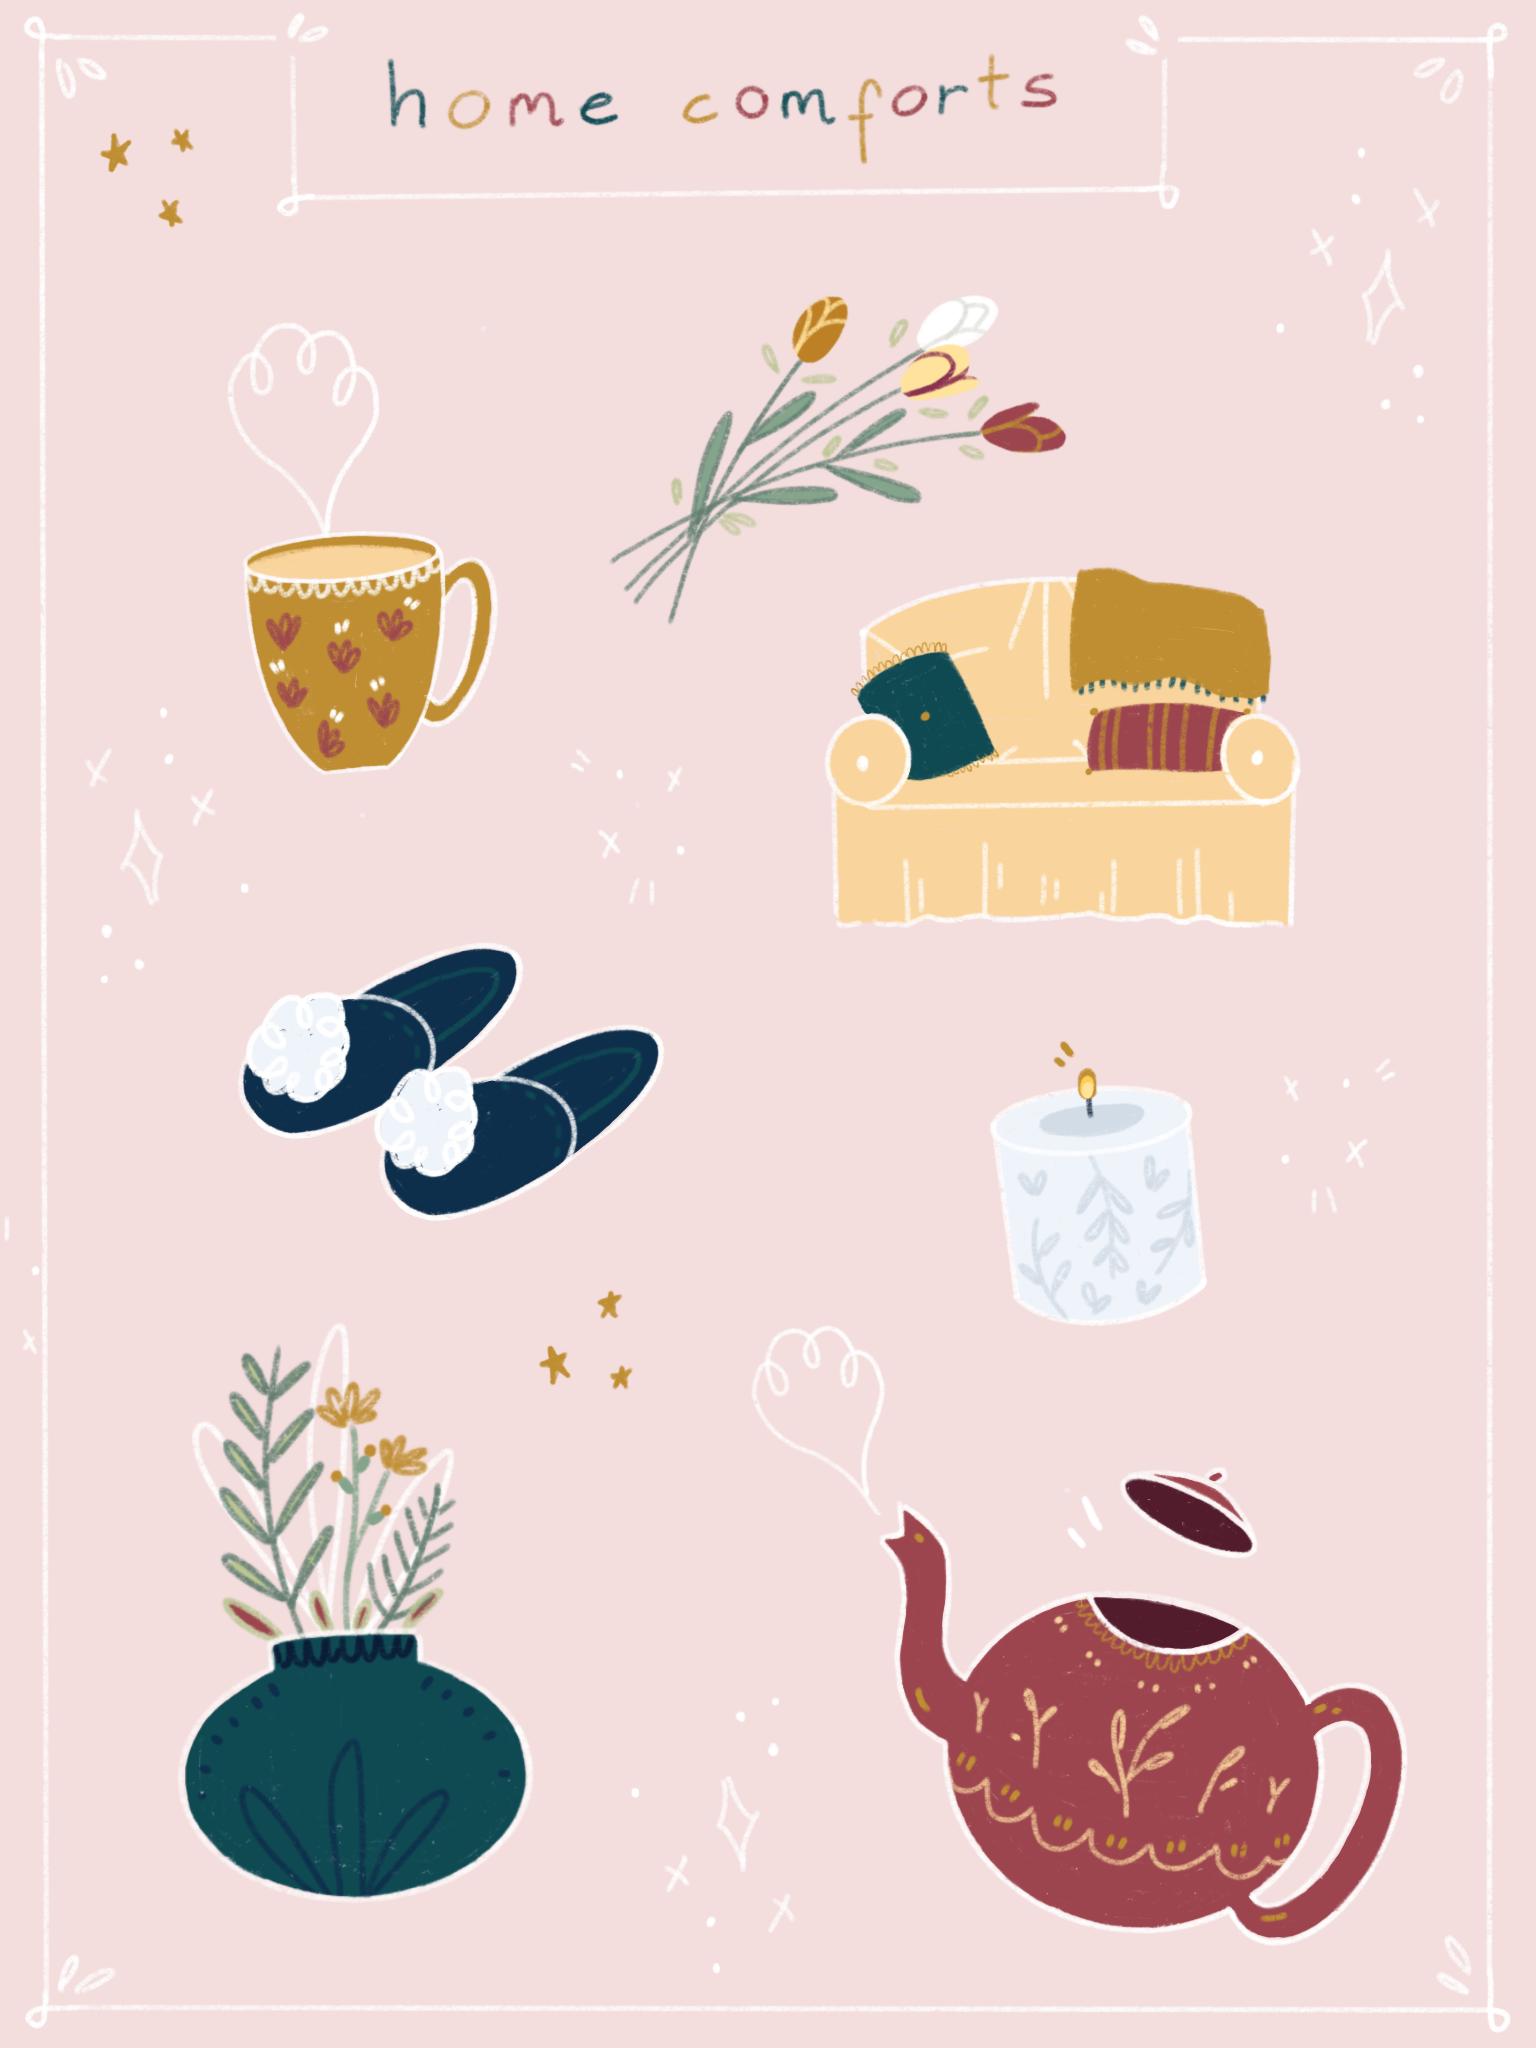 Home Comforts Part 2. Digital Illustration (2019)